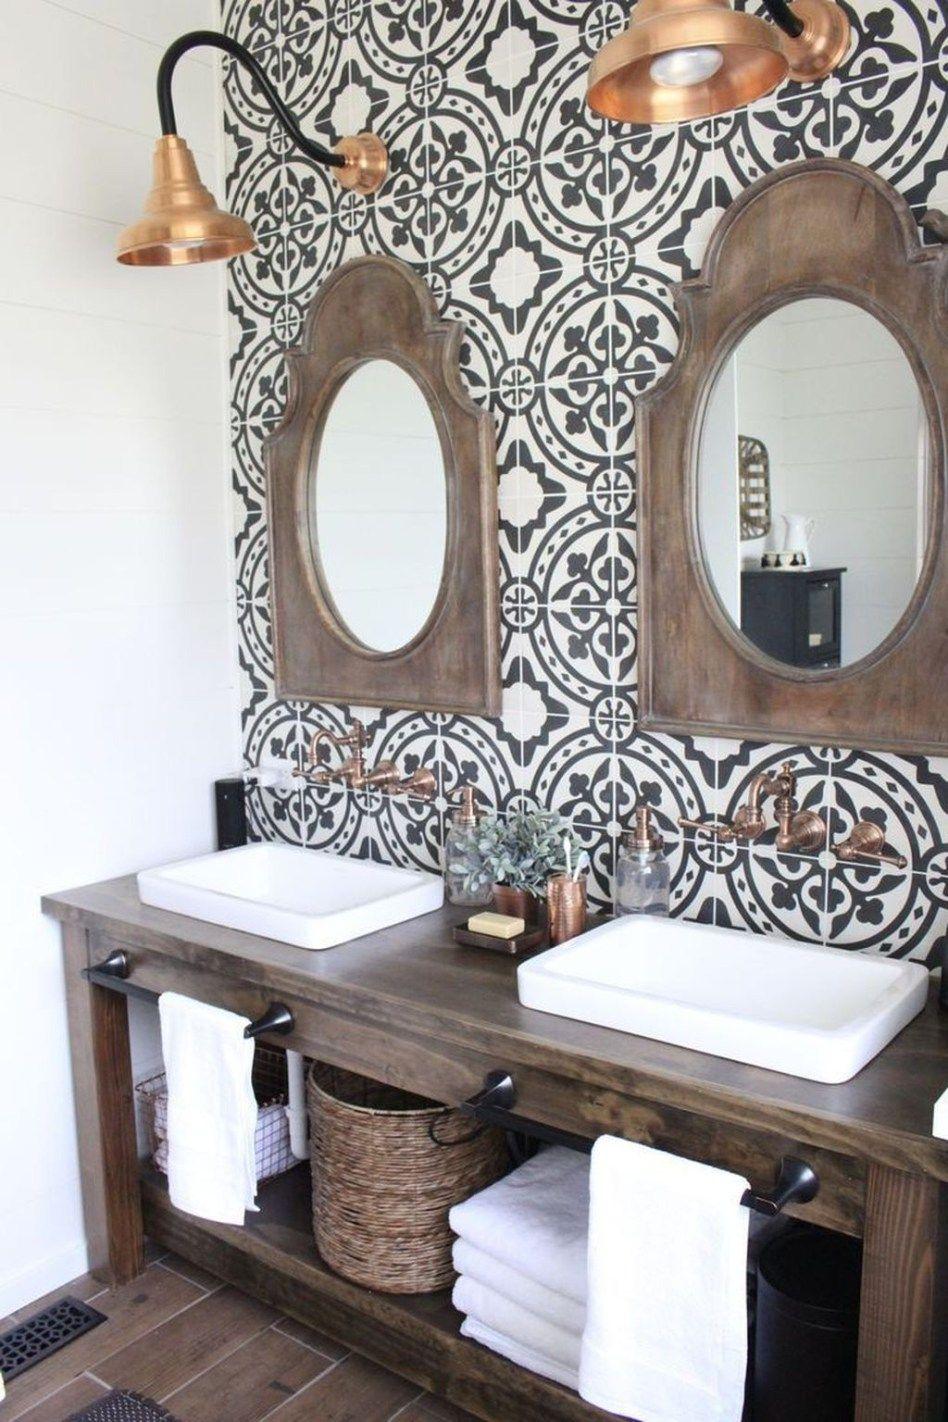 Modern Rustic Farmhouse Style Master Bathroom Ideas 39 ... on Rustic Farmhouse Bathroom Tile  id=99437